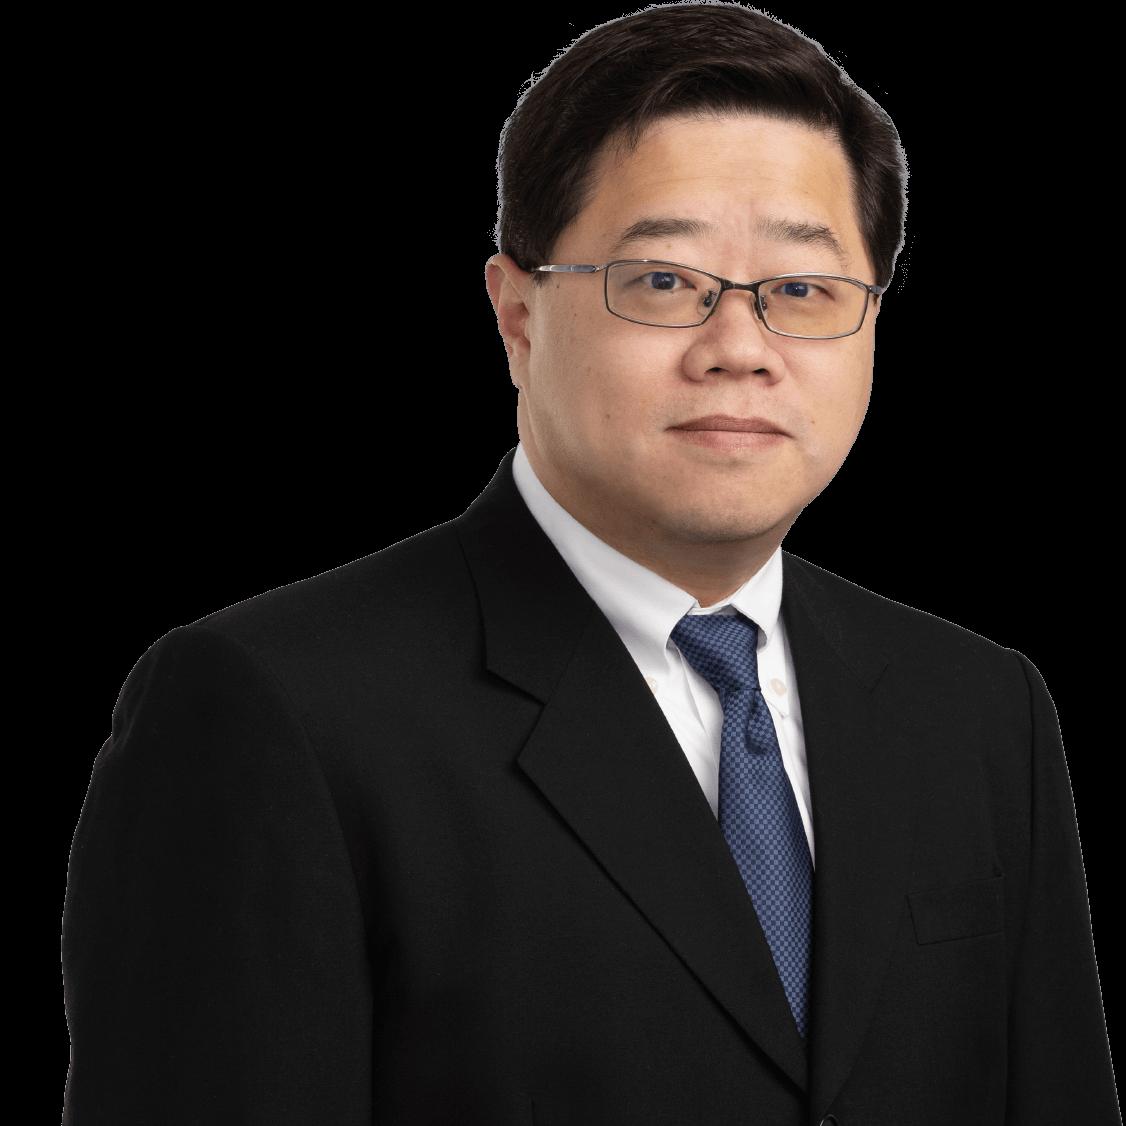 Geoff AuYeung